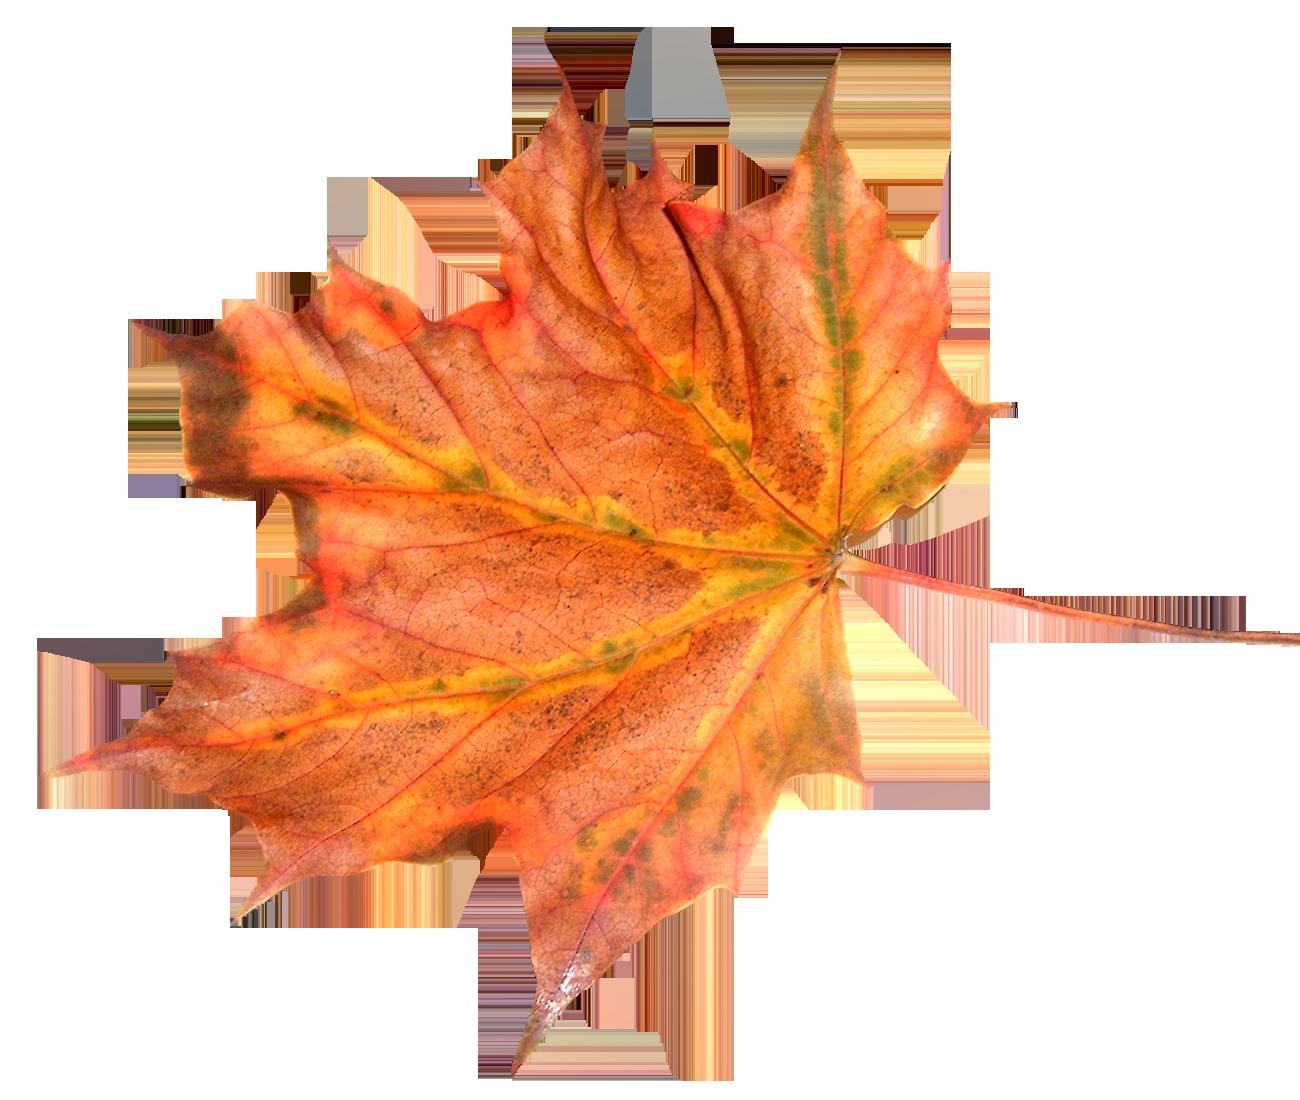 Tubes arbres png suitenature : feuilles png suite » - PNG Feuille Dautomne